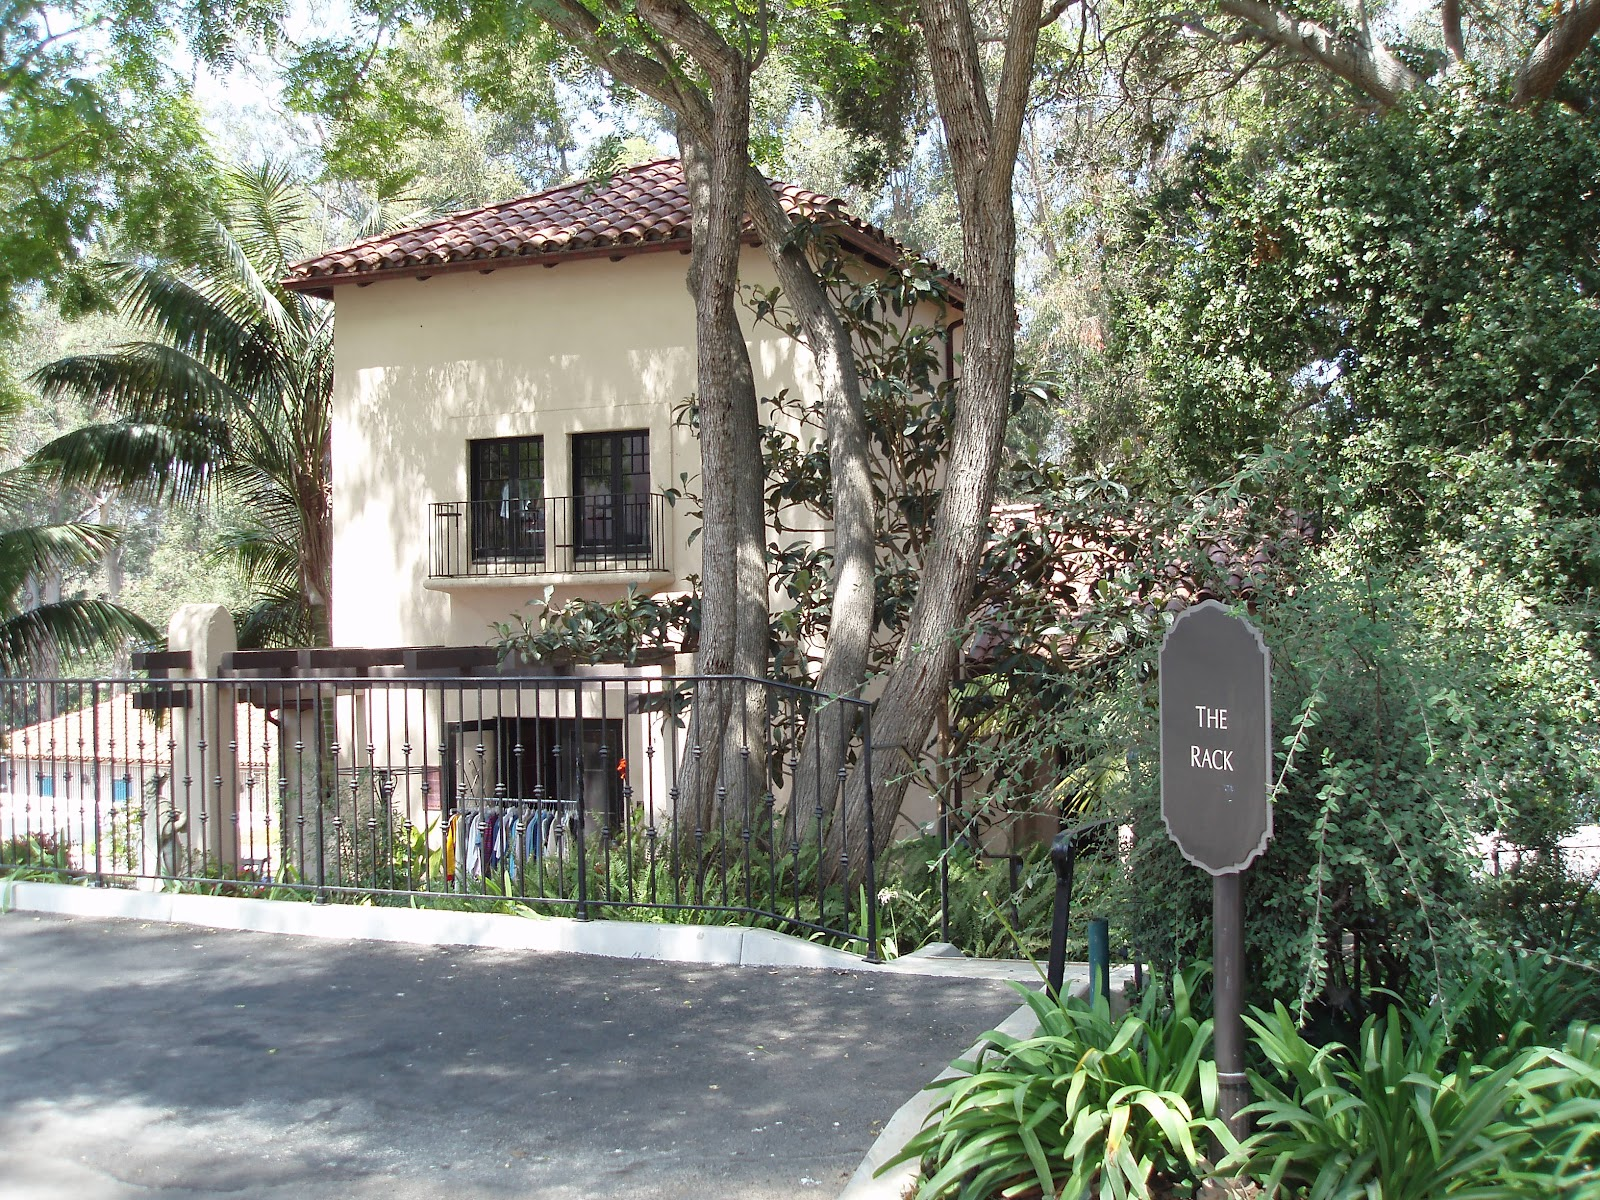 Santa Barbara Sights And Events Vintage Antique And